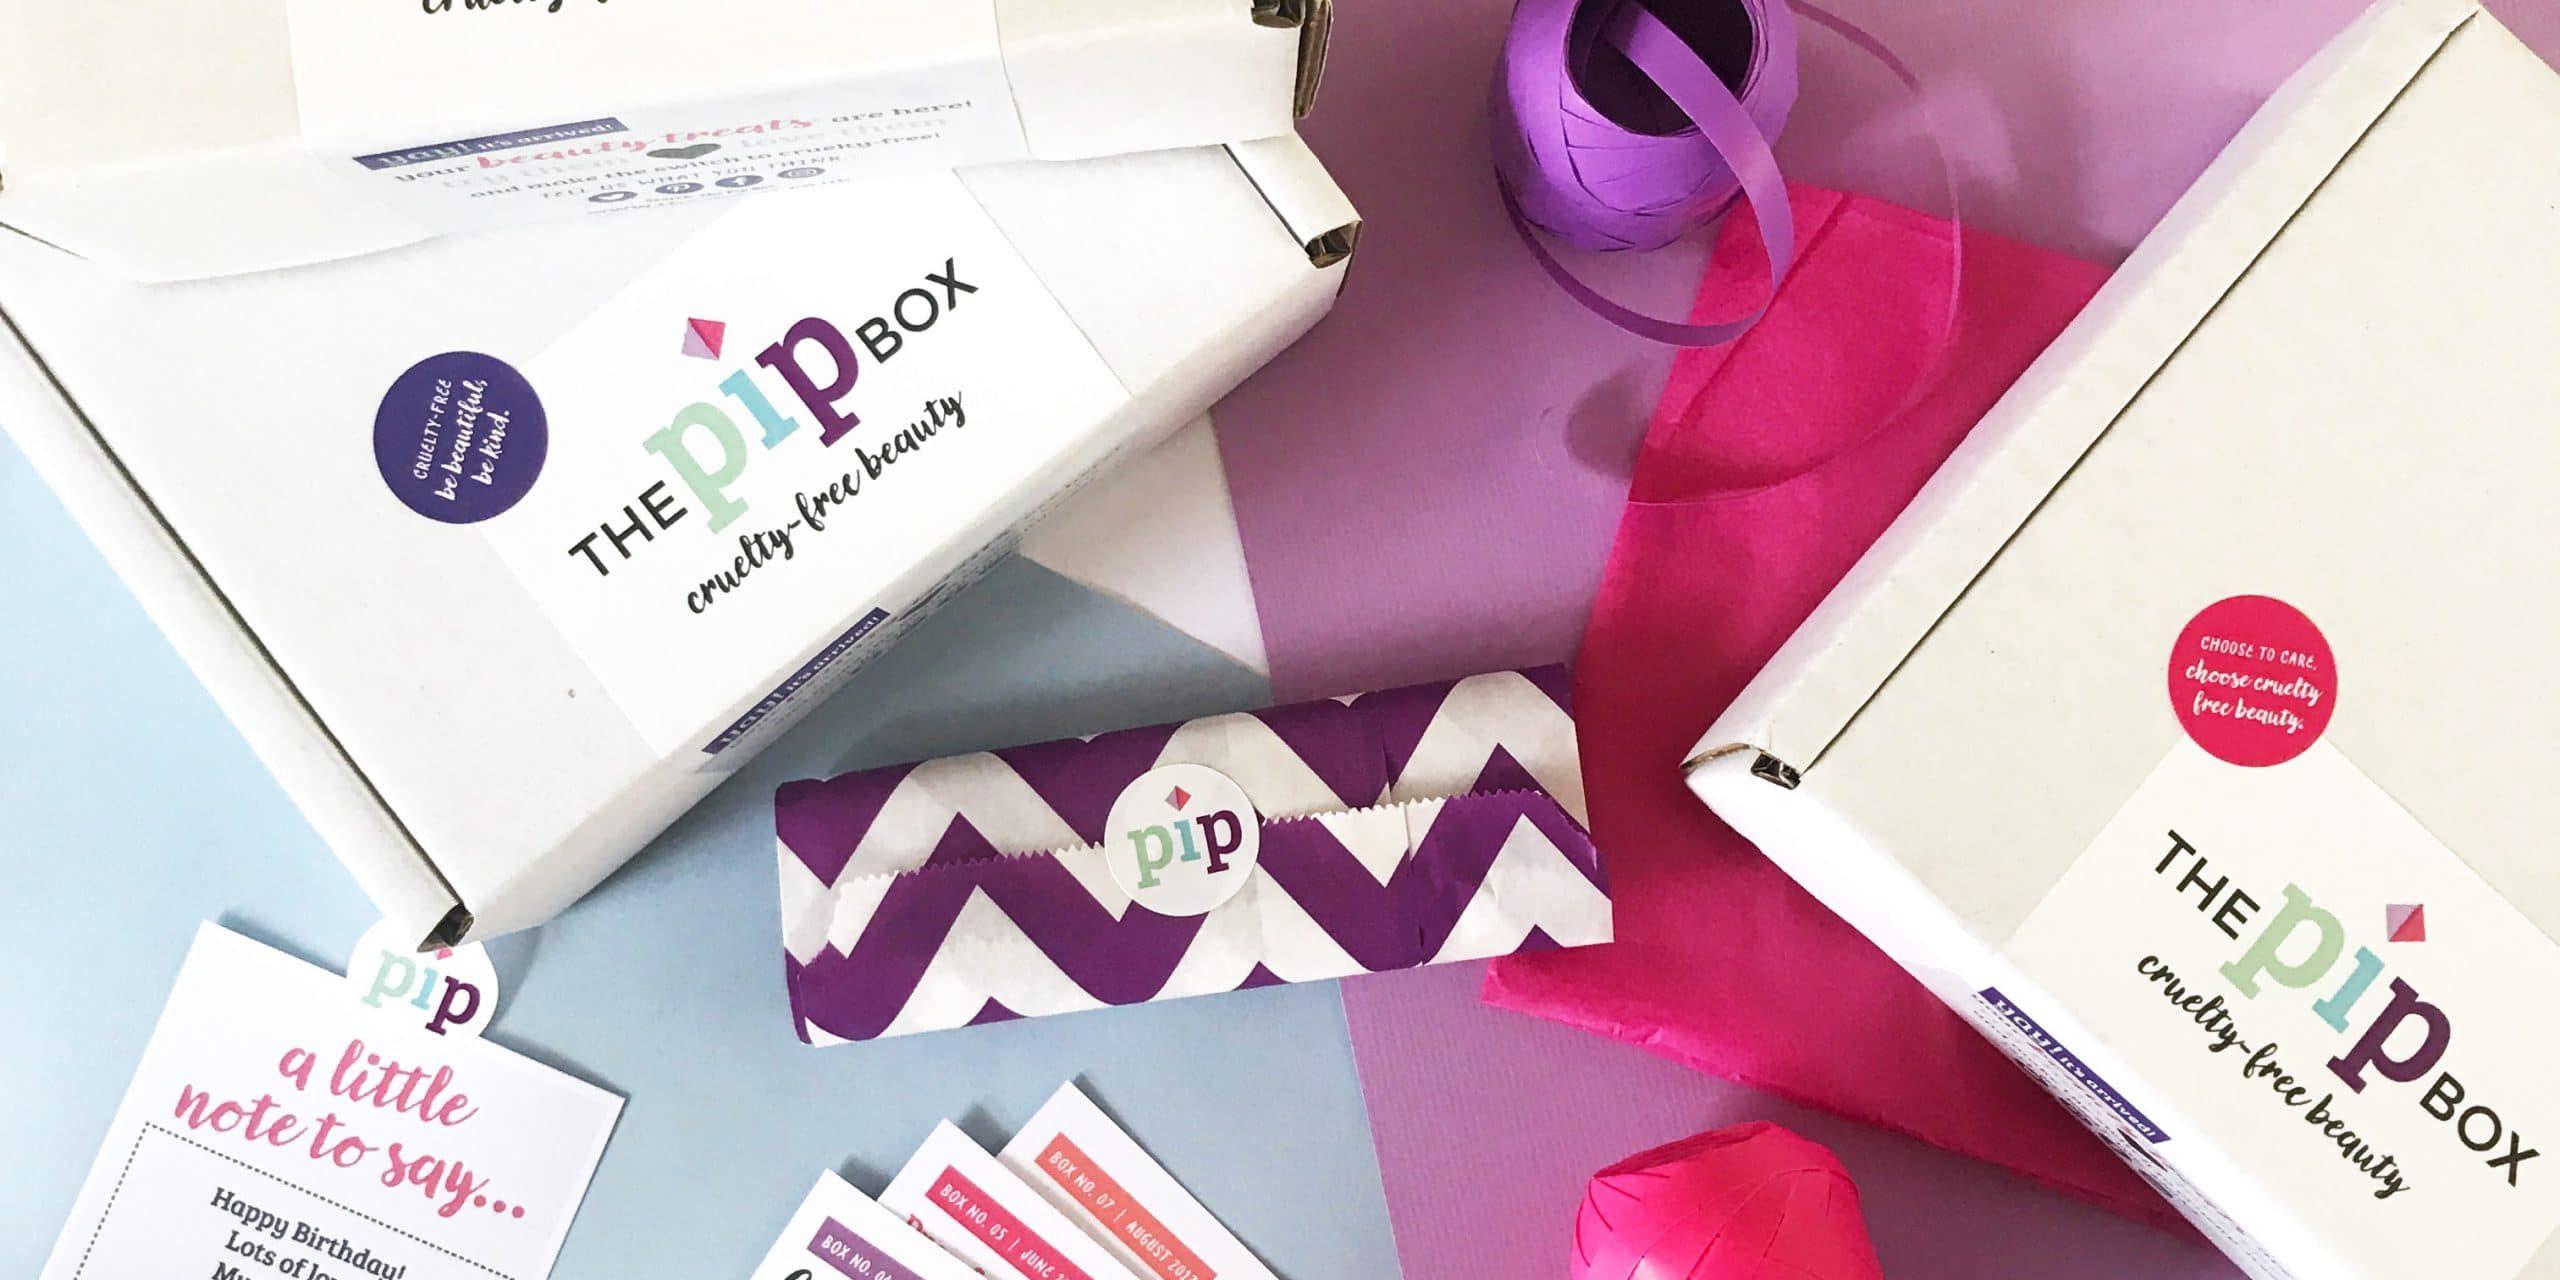 Tisserand Aromatherapy and The Pip Box